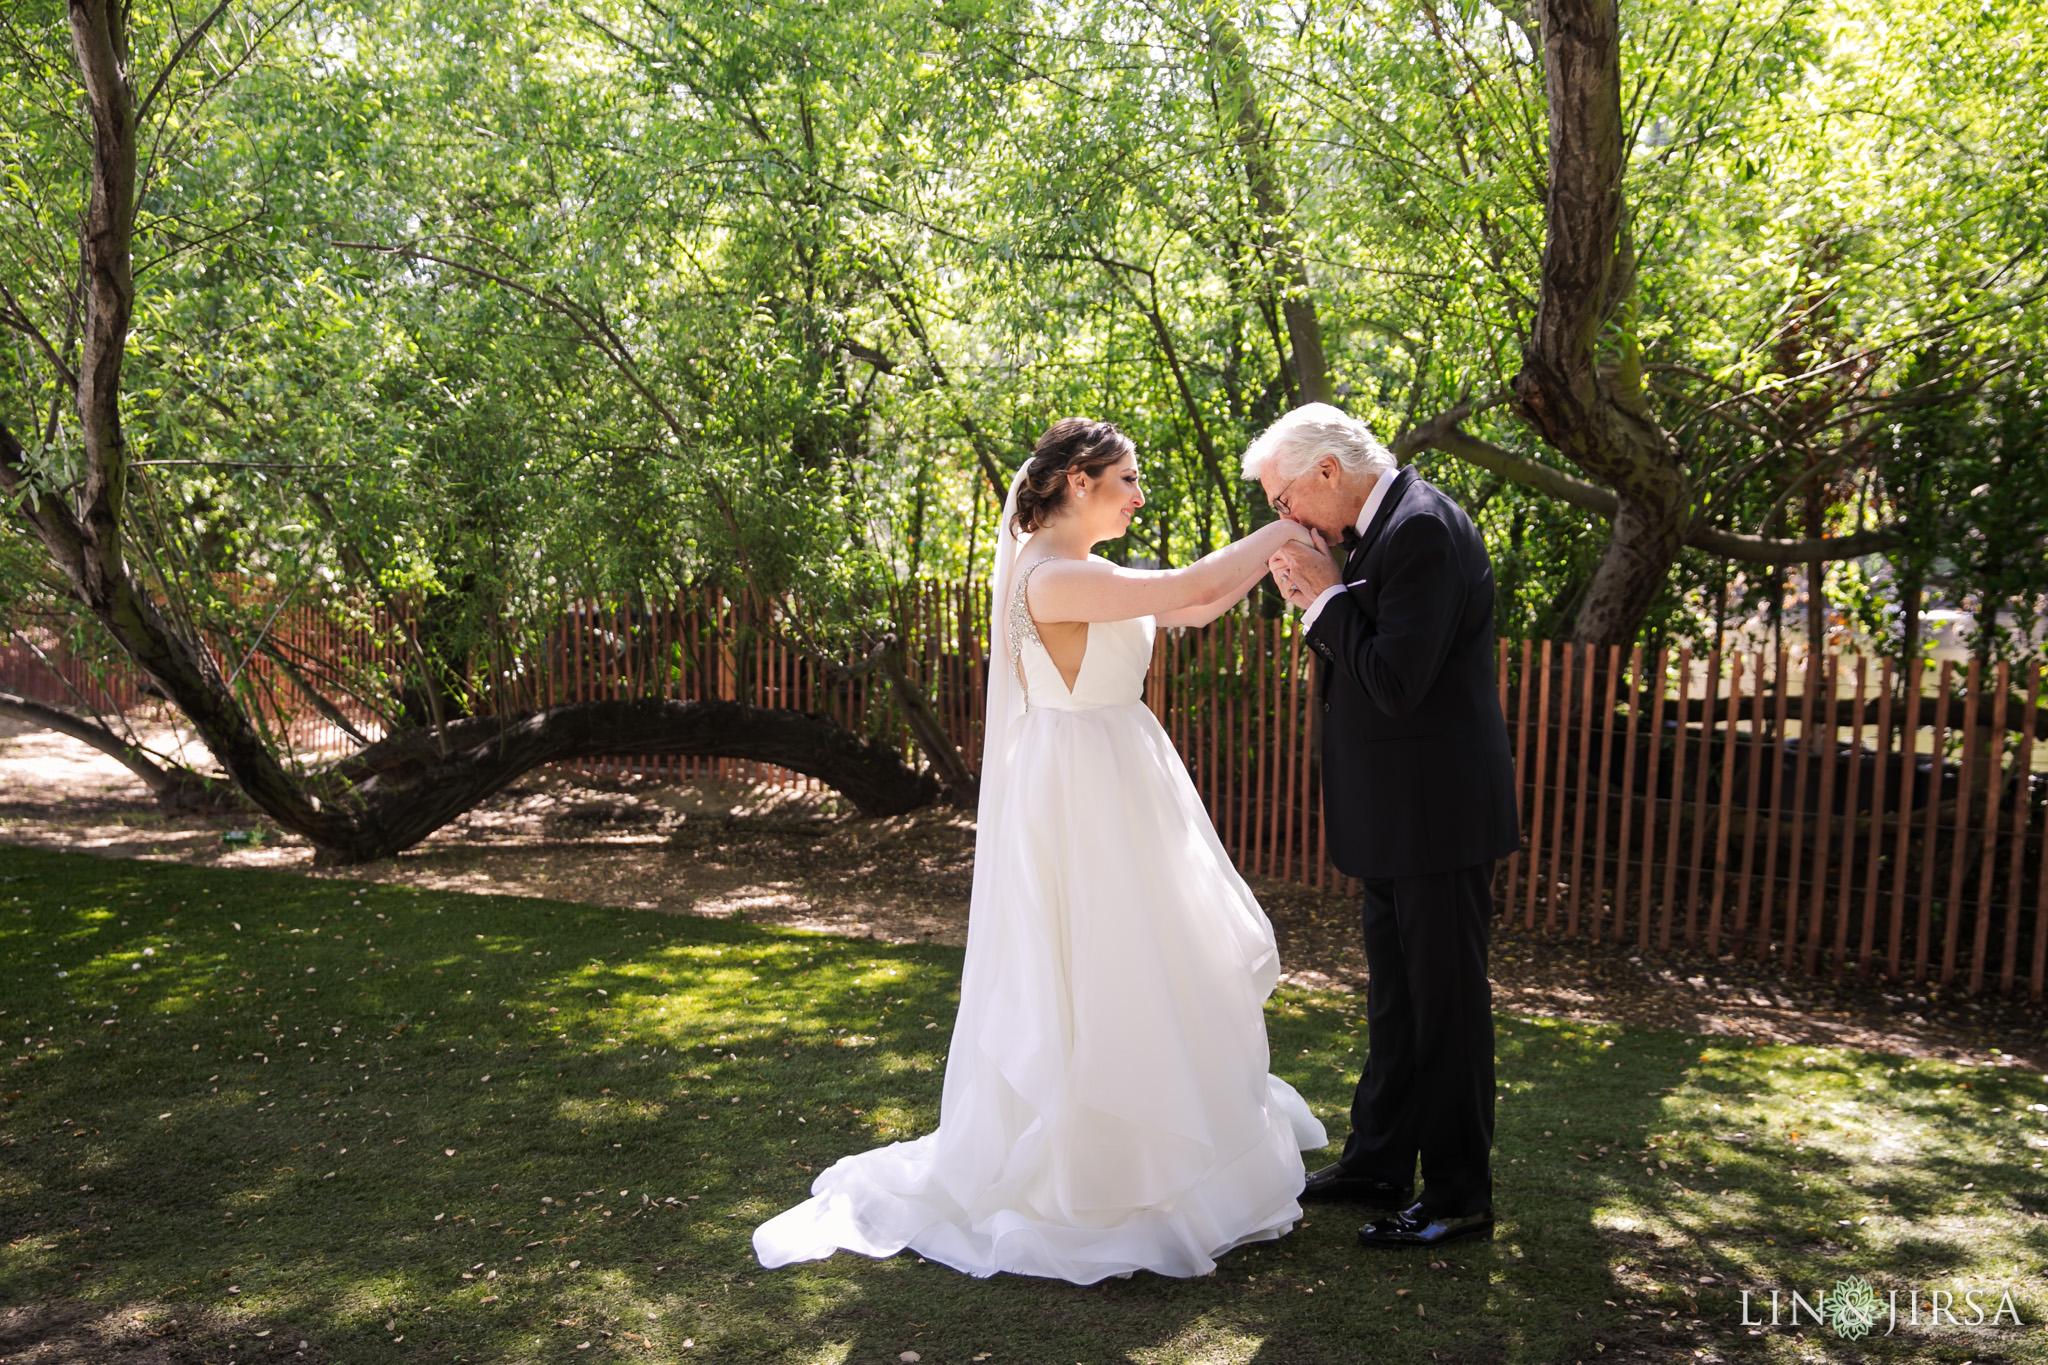 06 Calamigos Ranch Malibu Wedding Photography